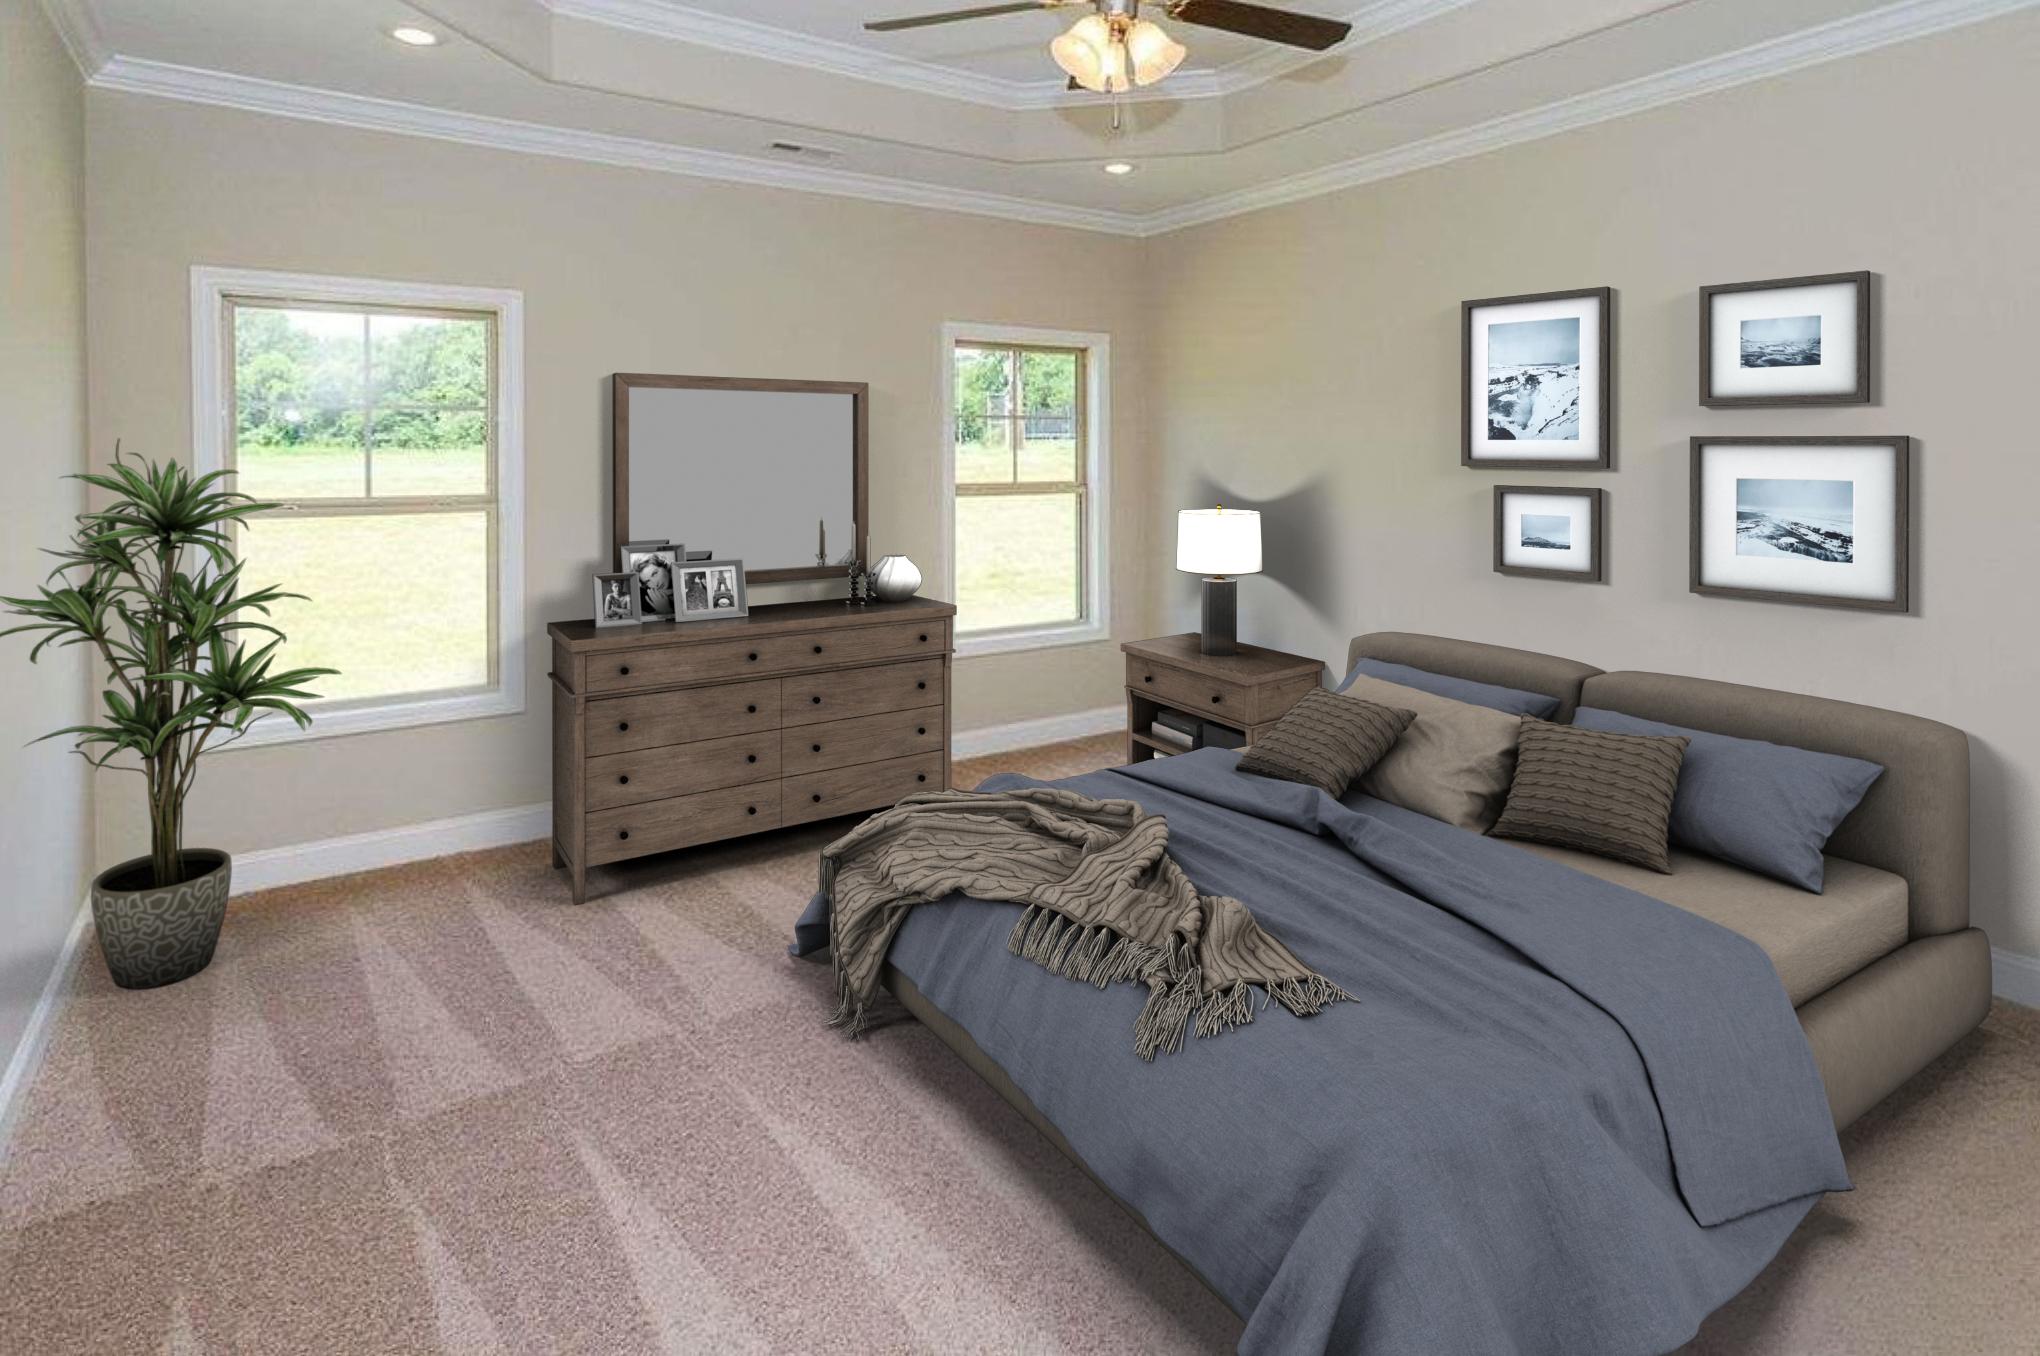 Bedroom 1 - Scene 4  - Standard